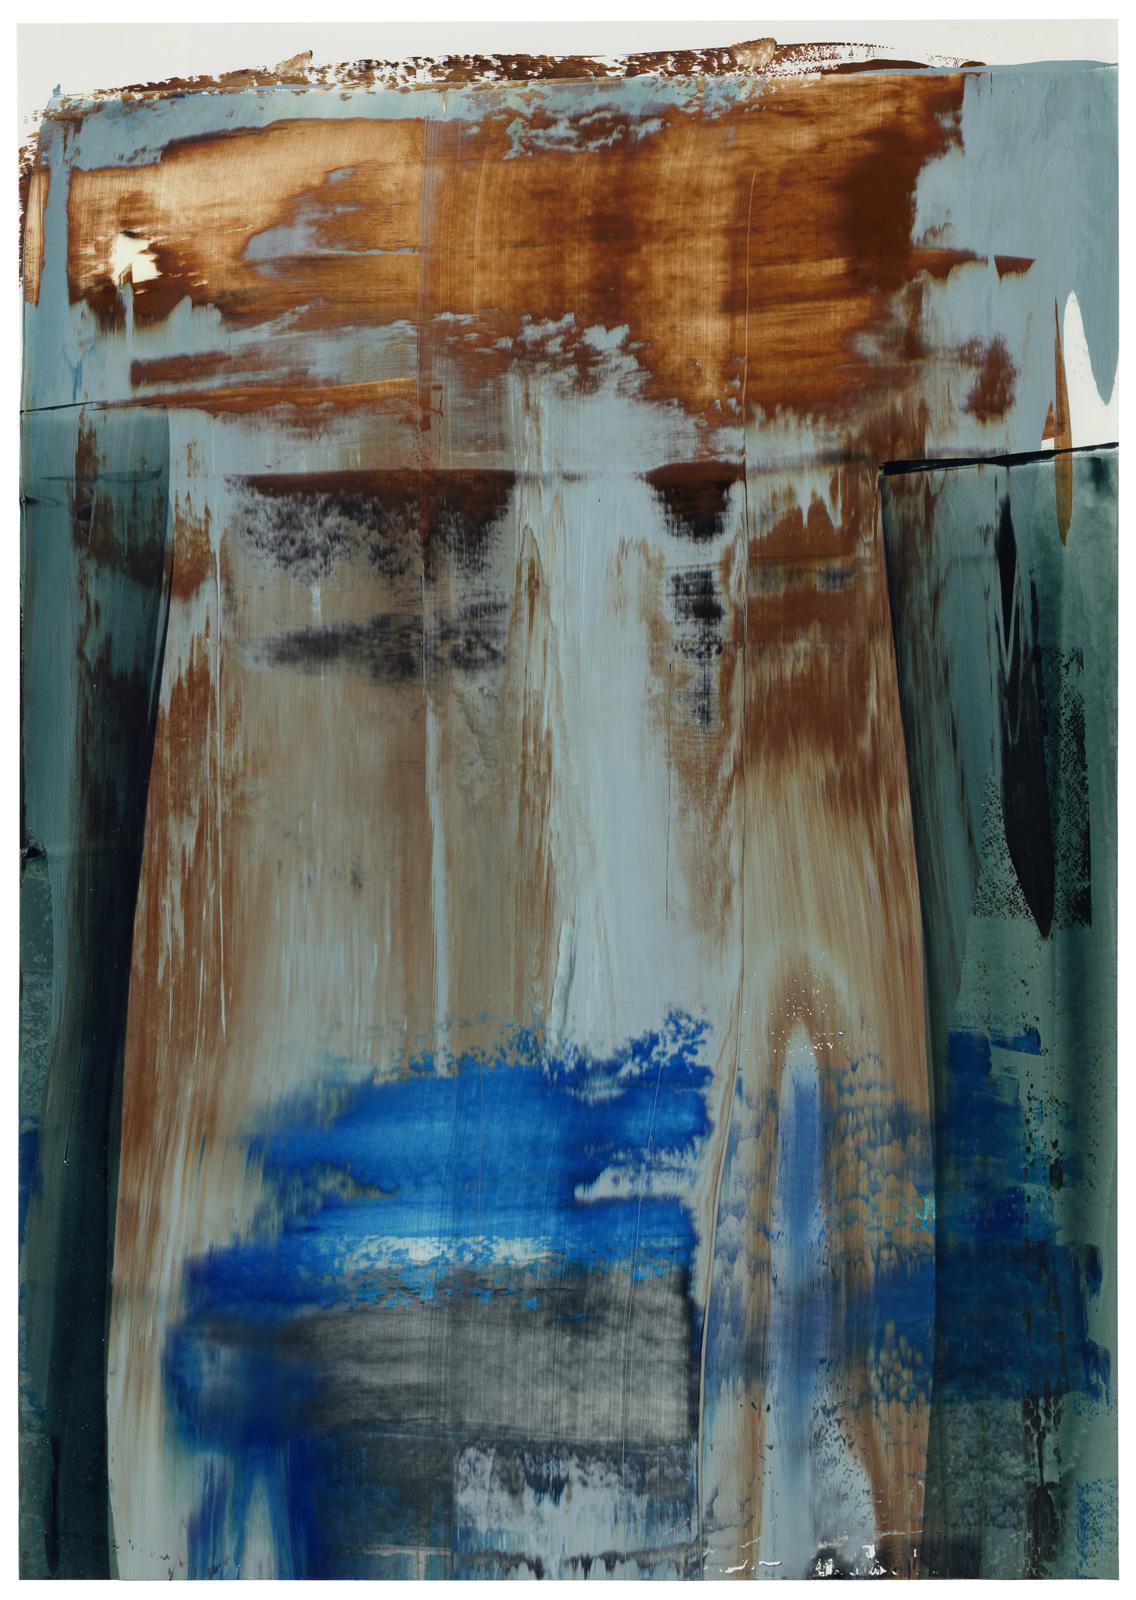 ohne Titel, Öl auf Papier, 51x36cm, 2019